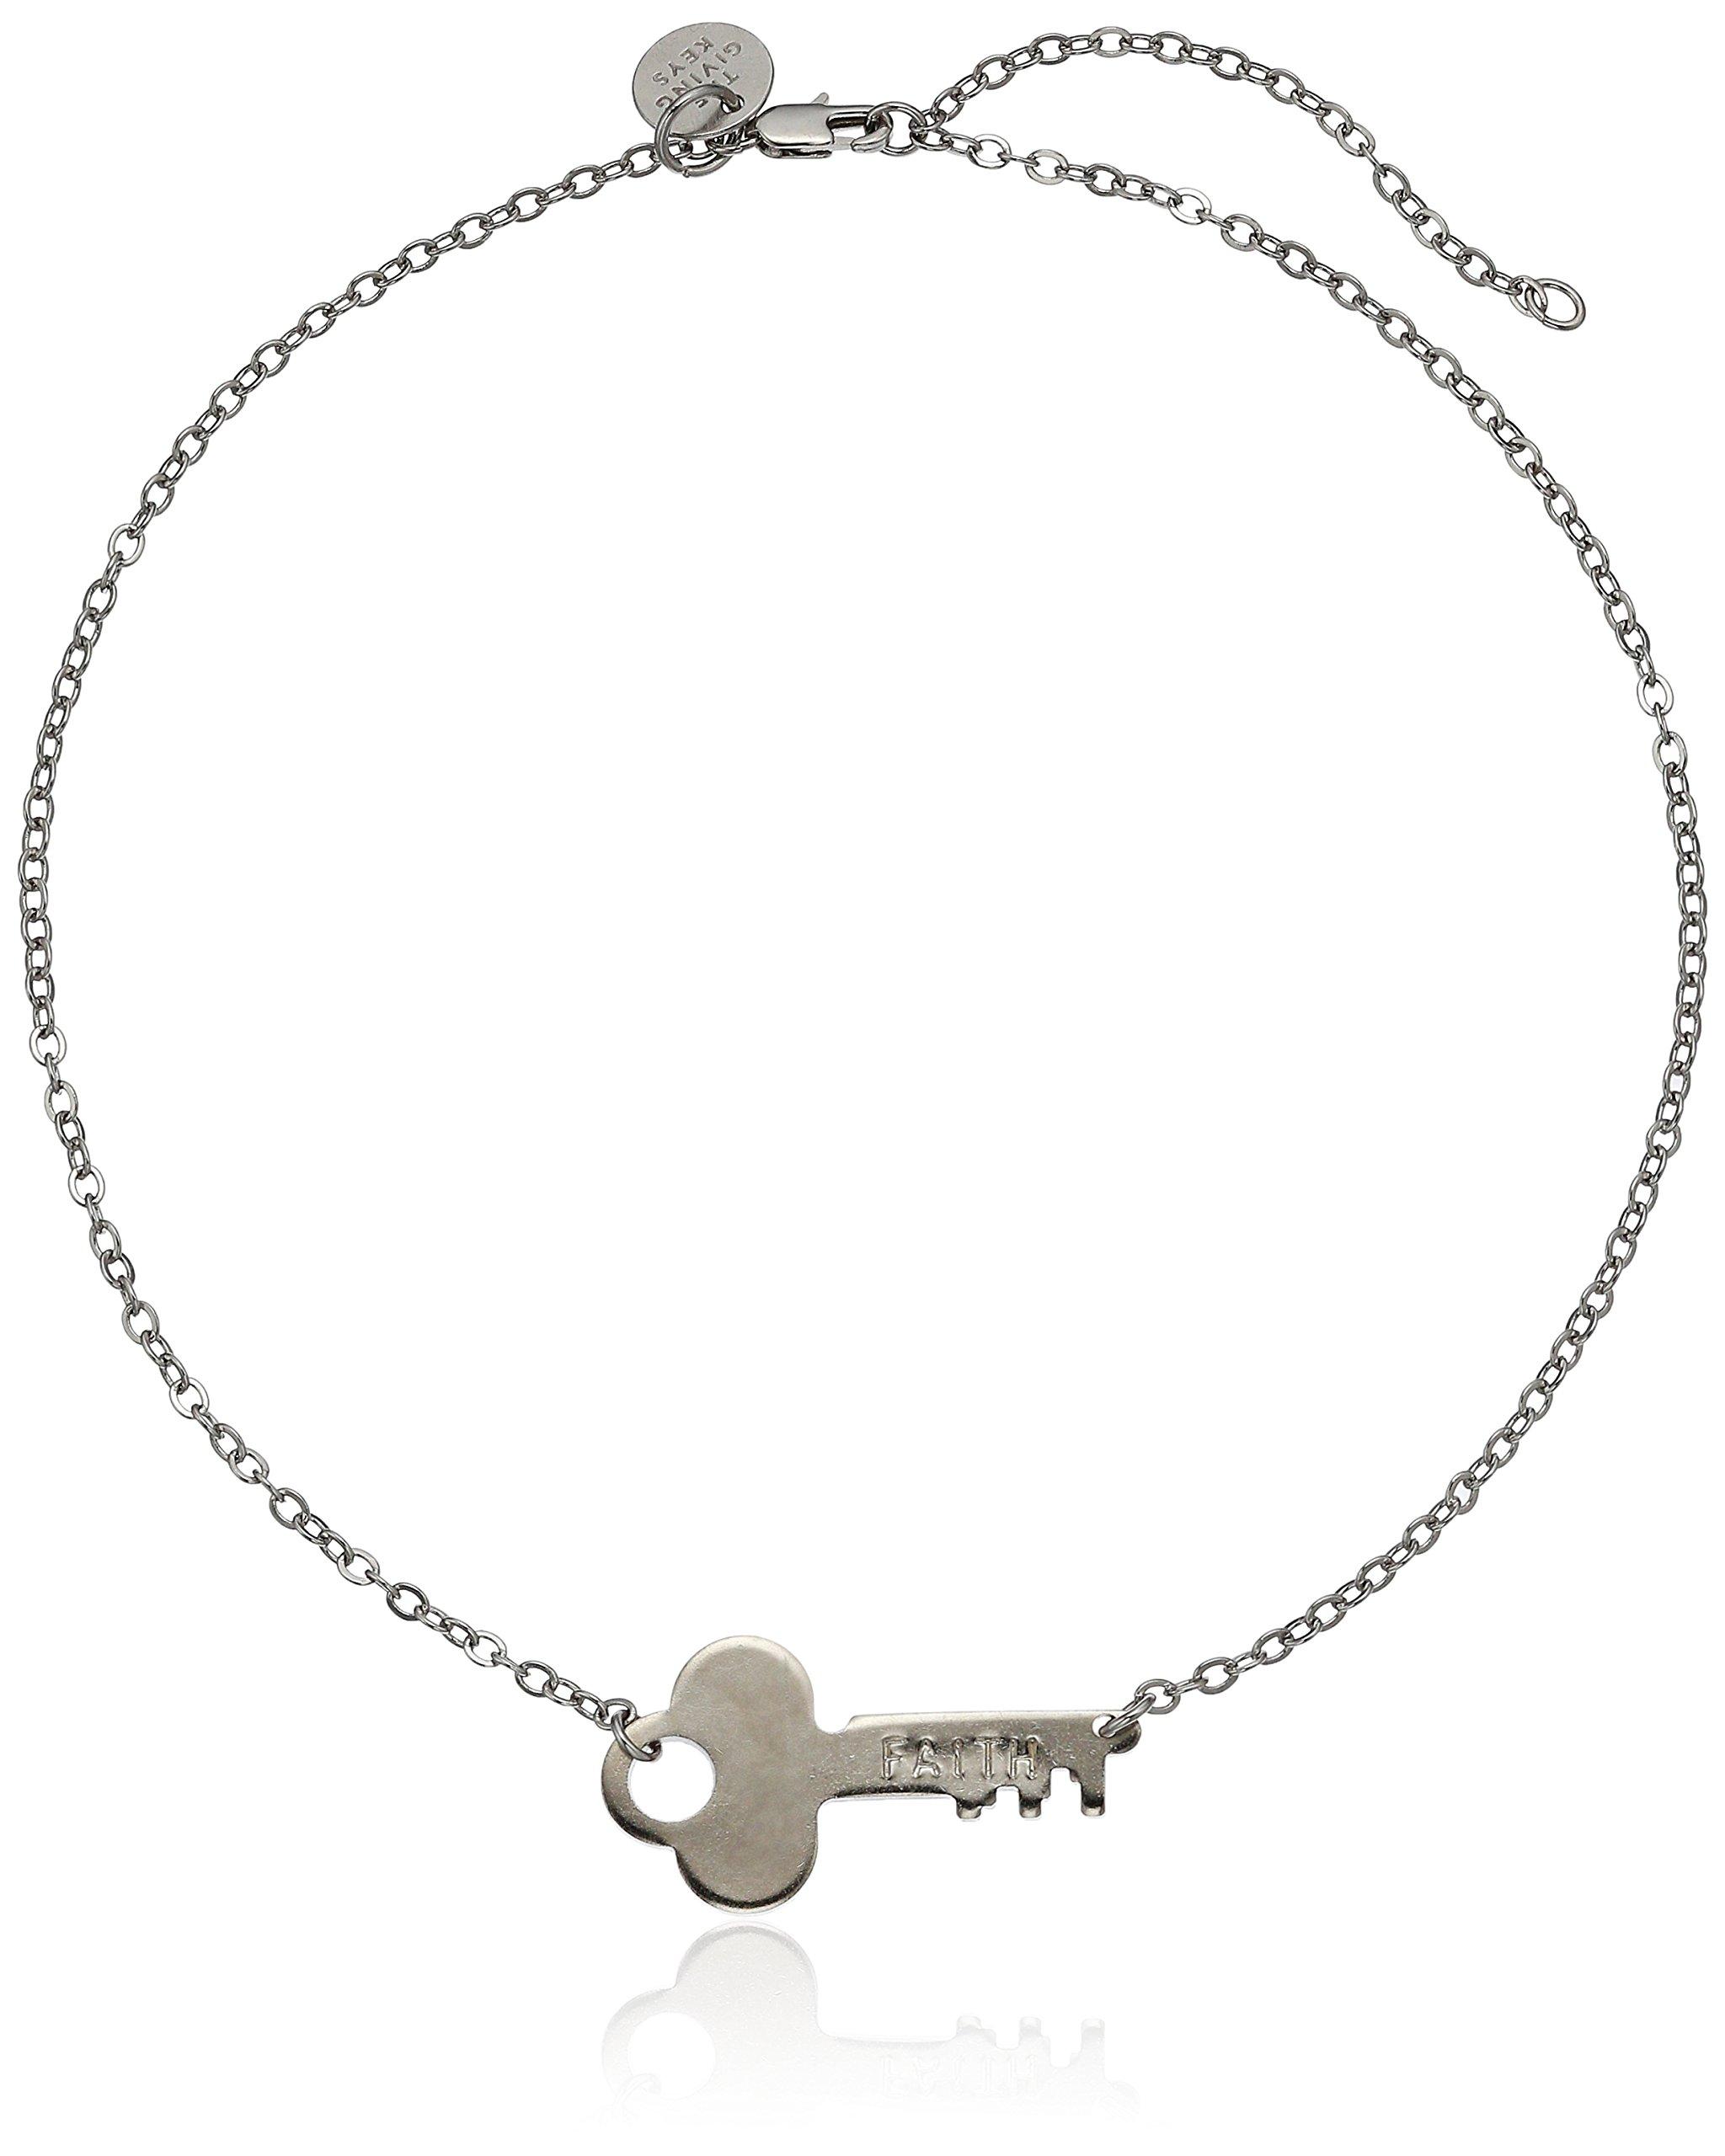 The Giving Keys Neverending Silver Choker Necklace FAITH